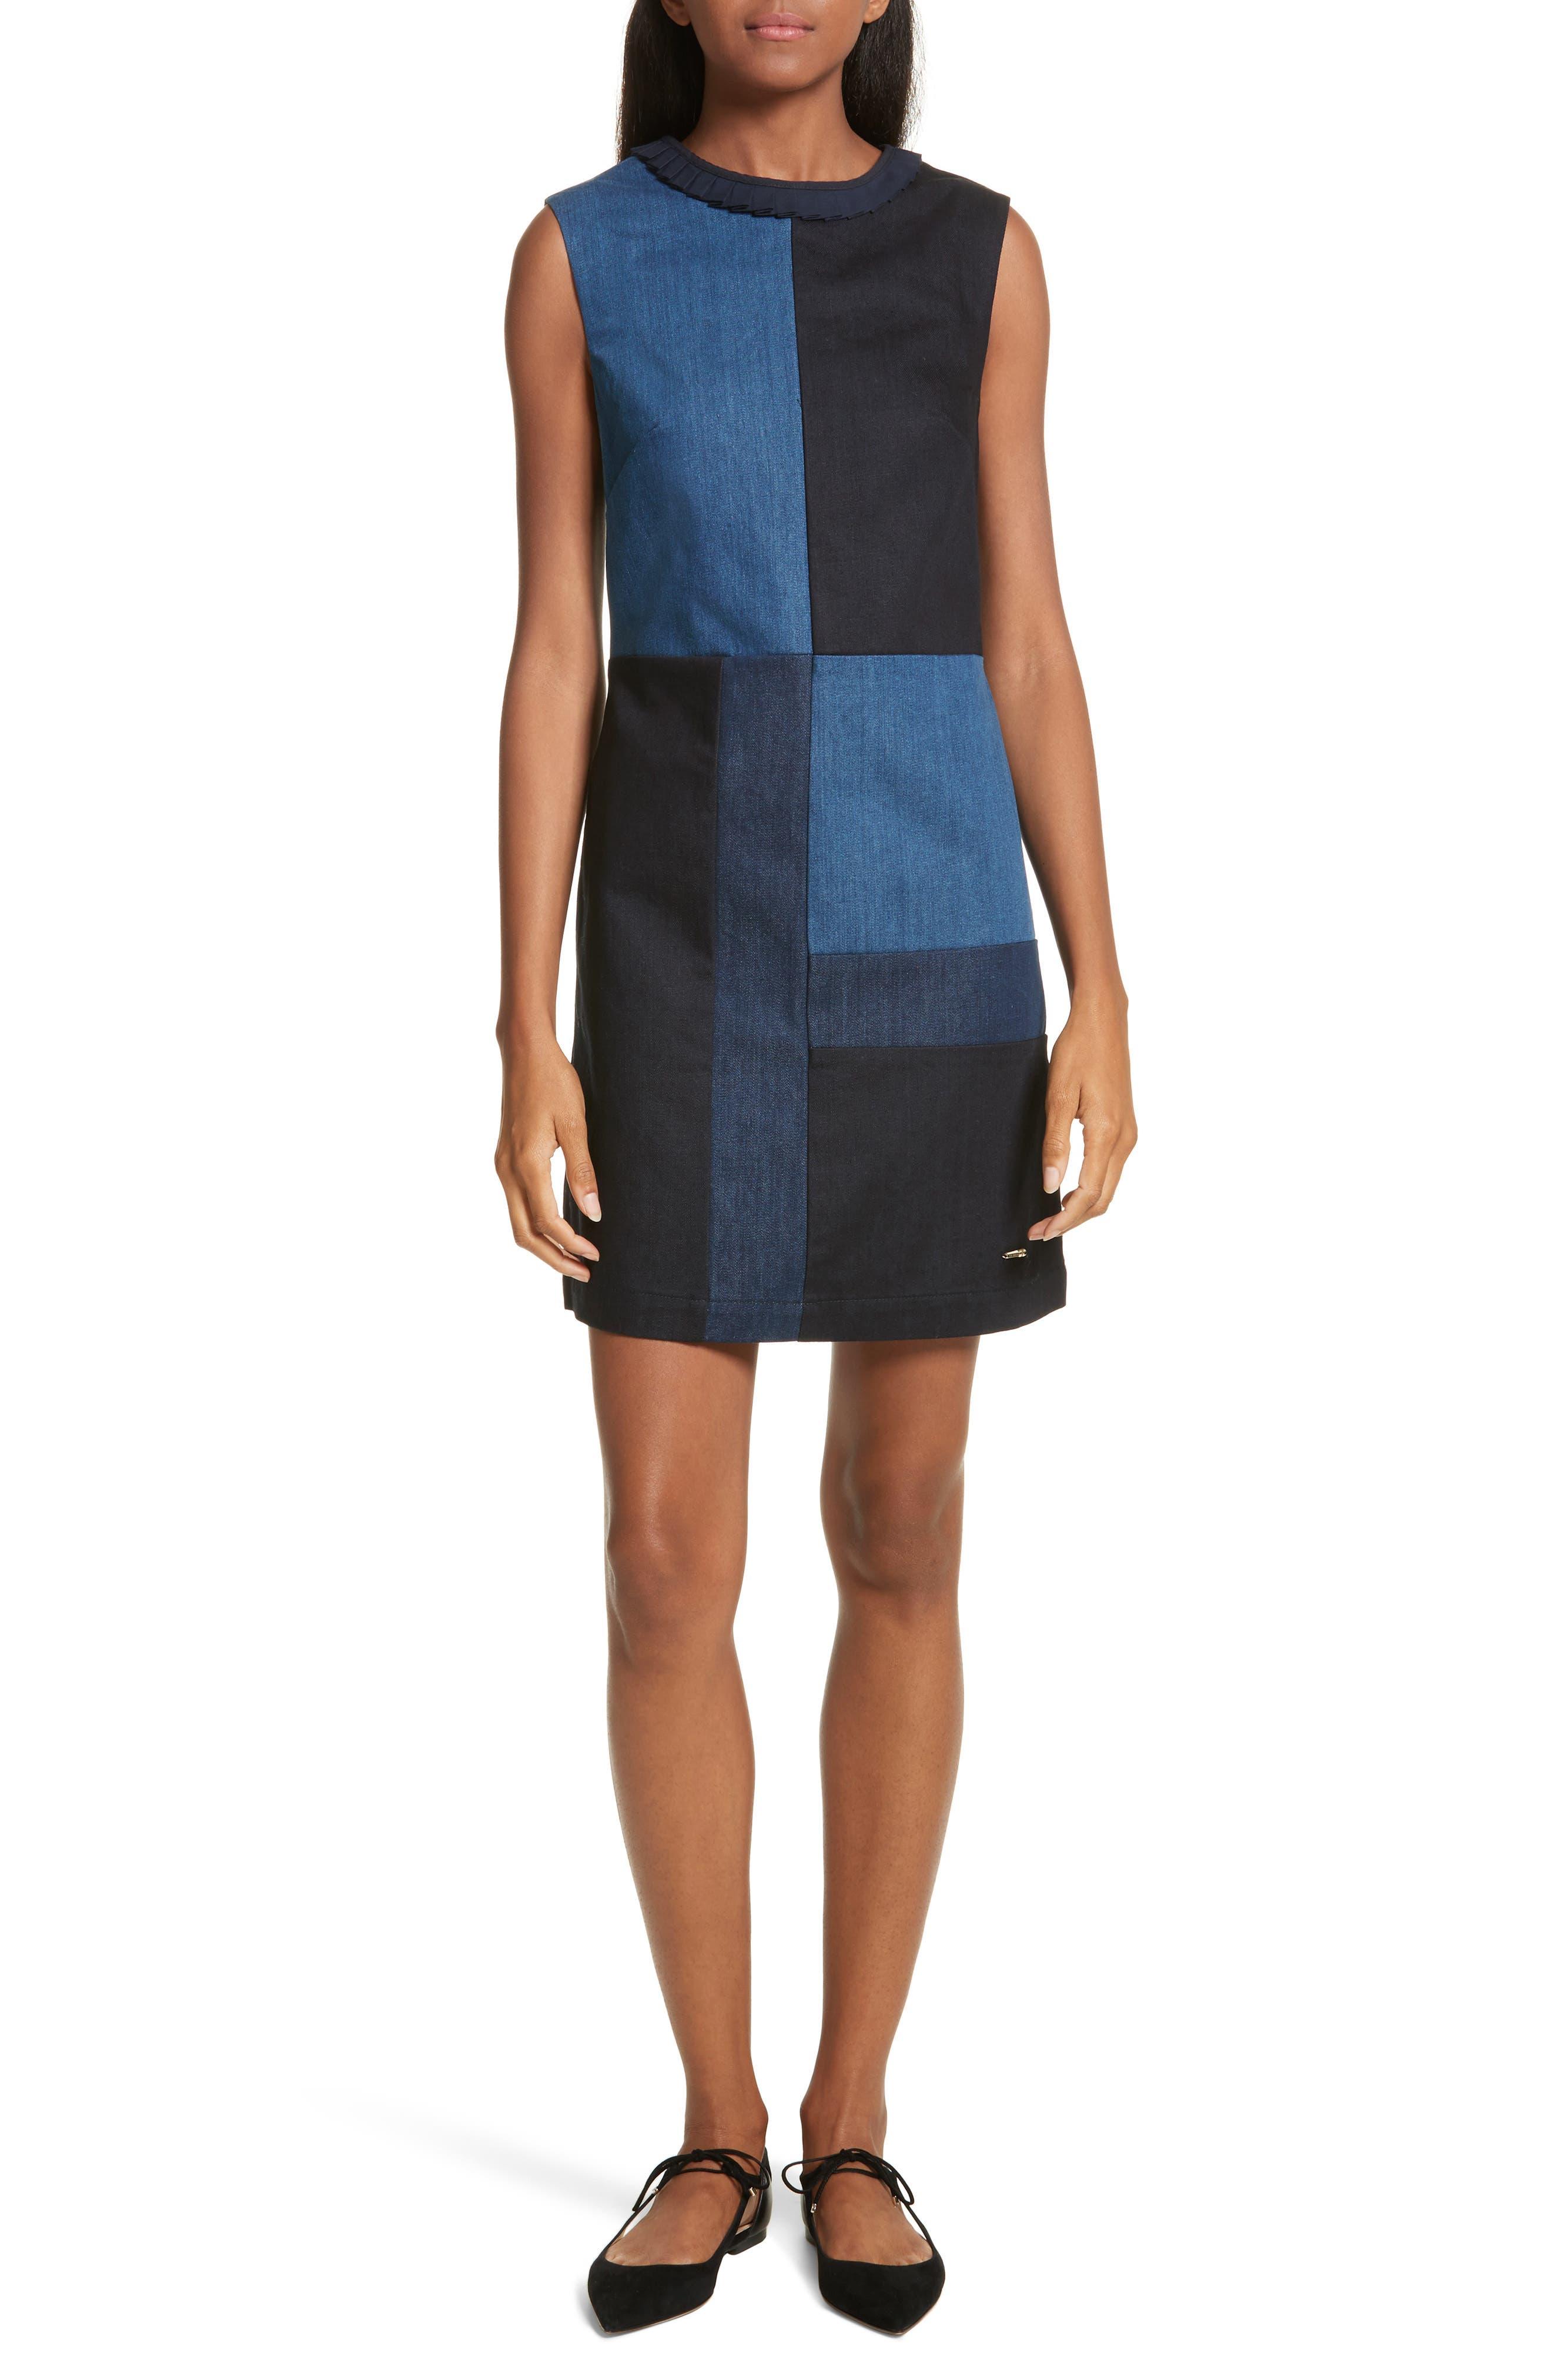 Main Image - Ted Baker Morfee London Colorblock Denim A-Line Dress